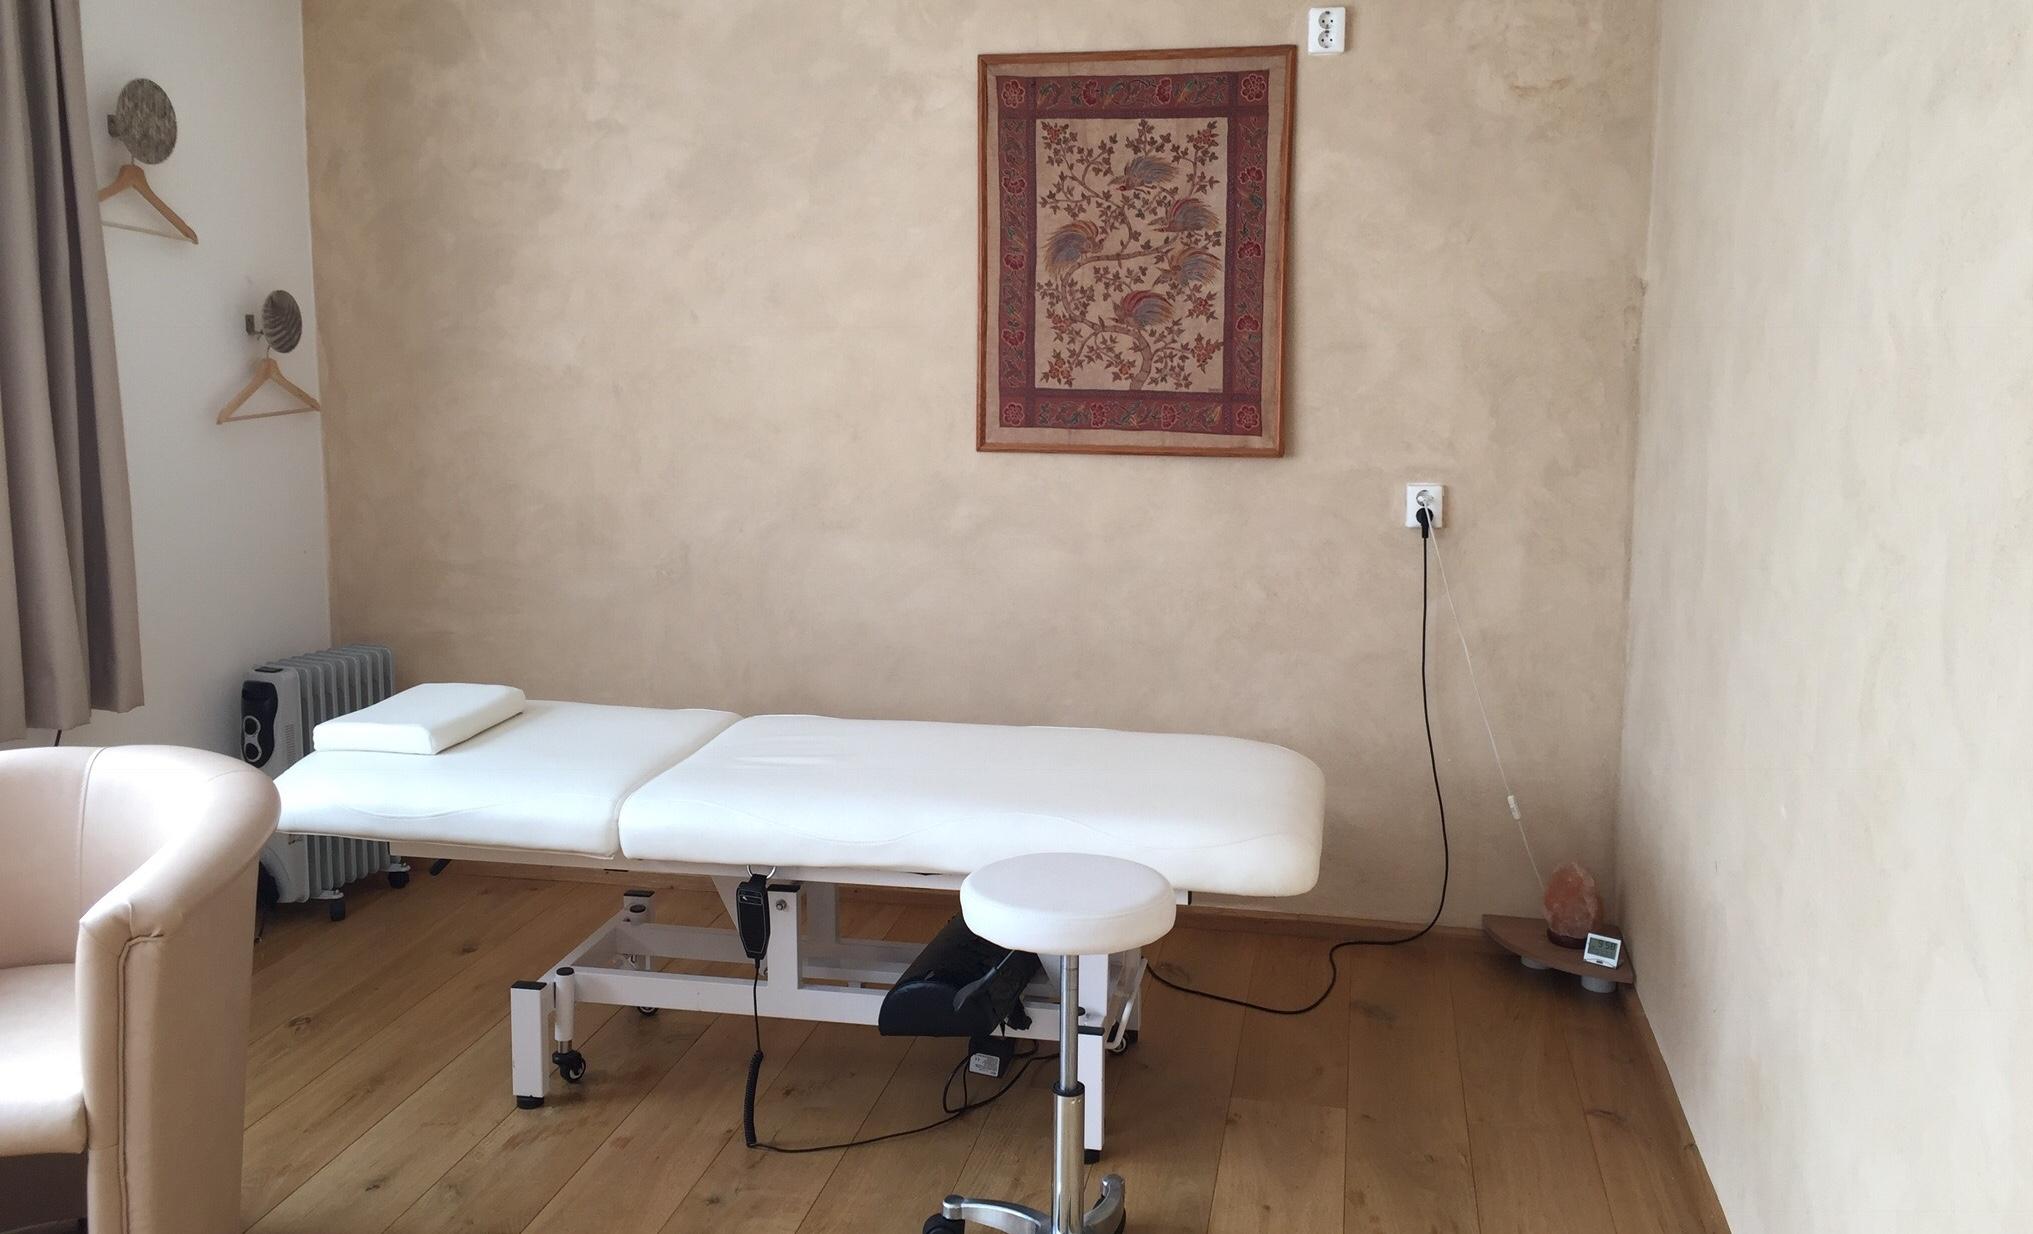 acupunctureclinicrotterdam.jpeg